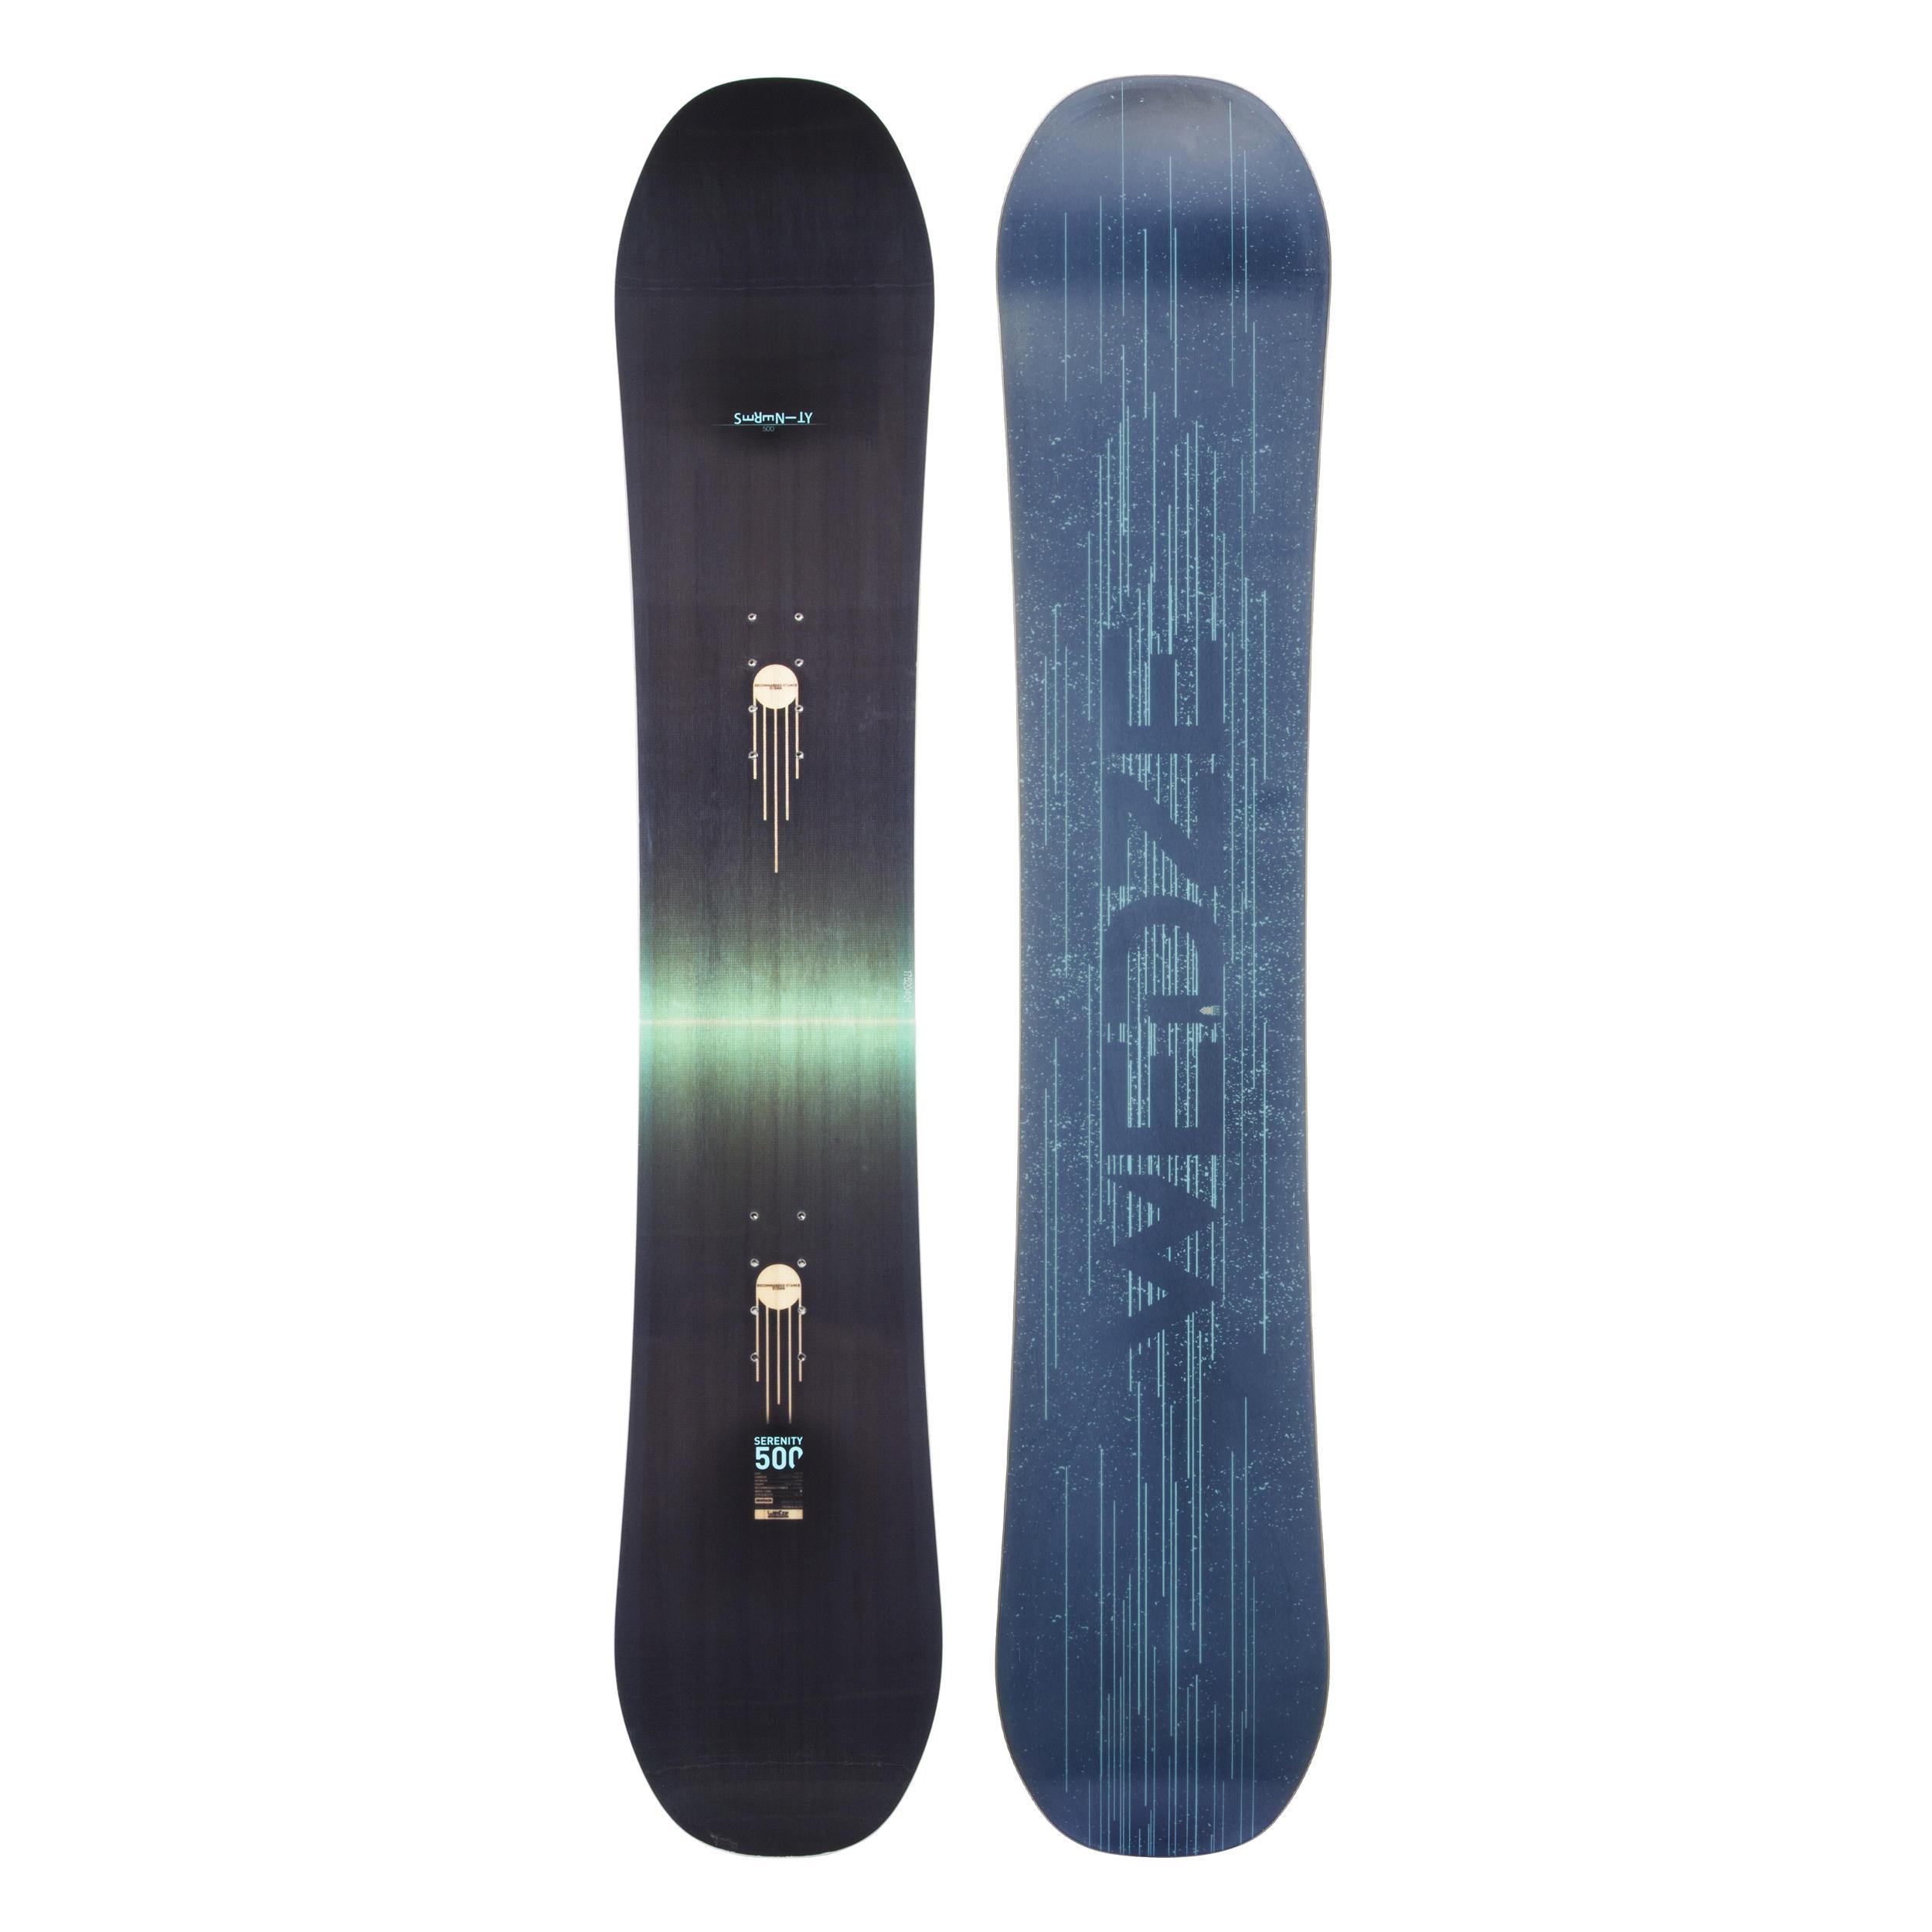 Snowboard Serenity 500 imagine